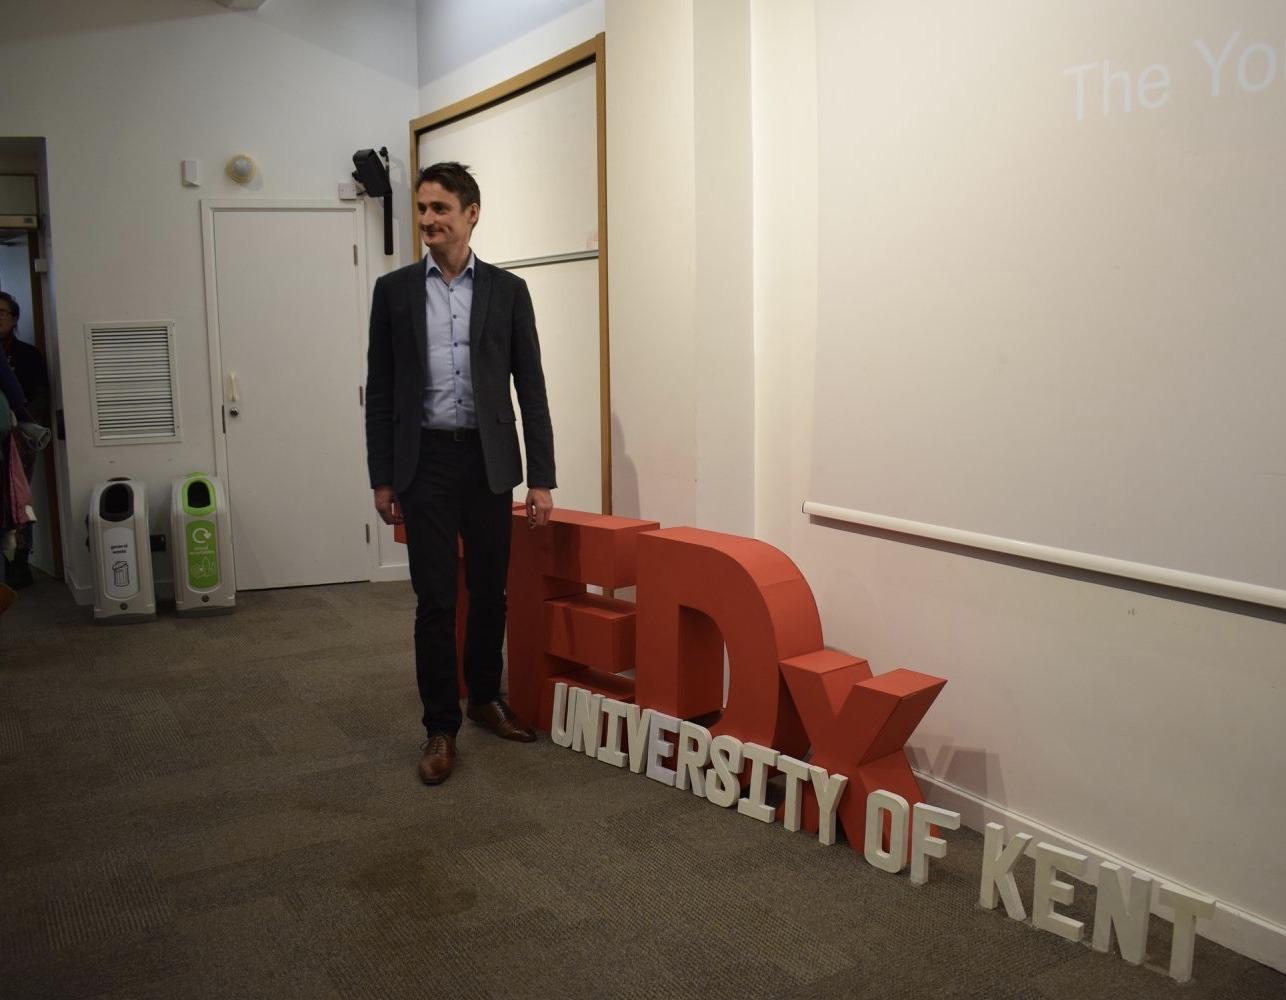 TEDx public speaking